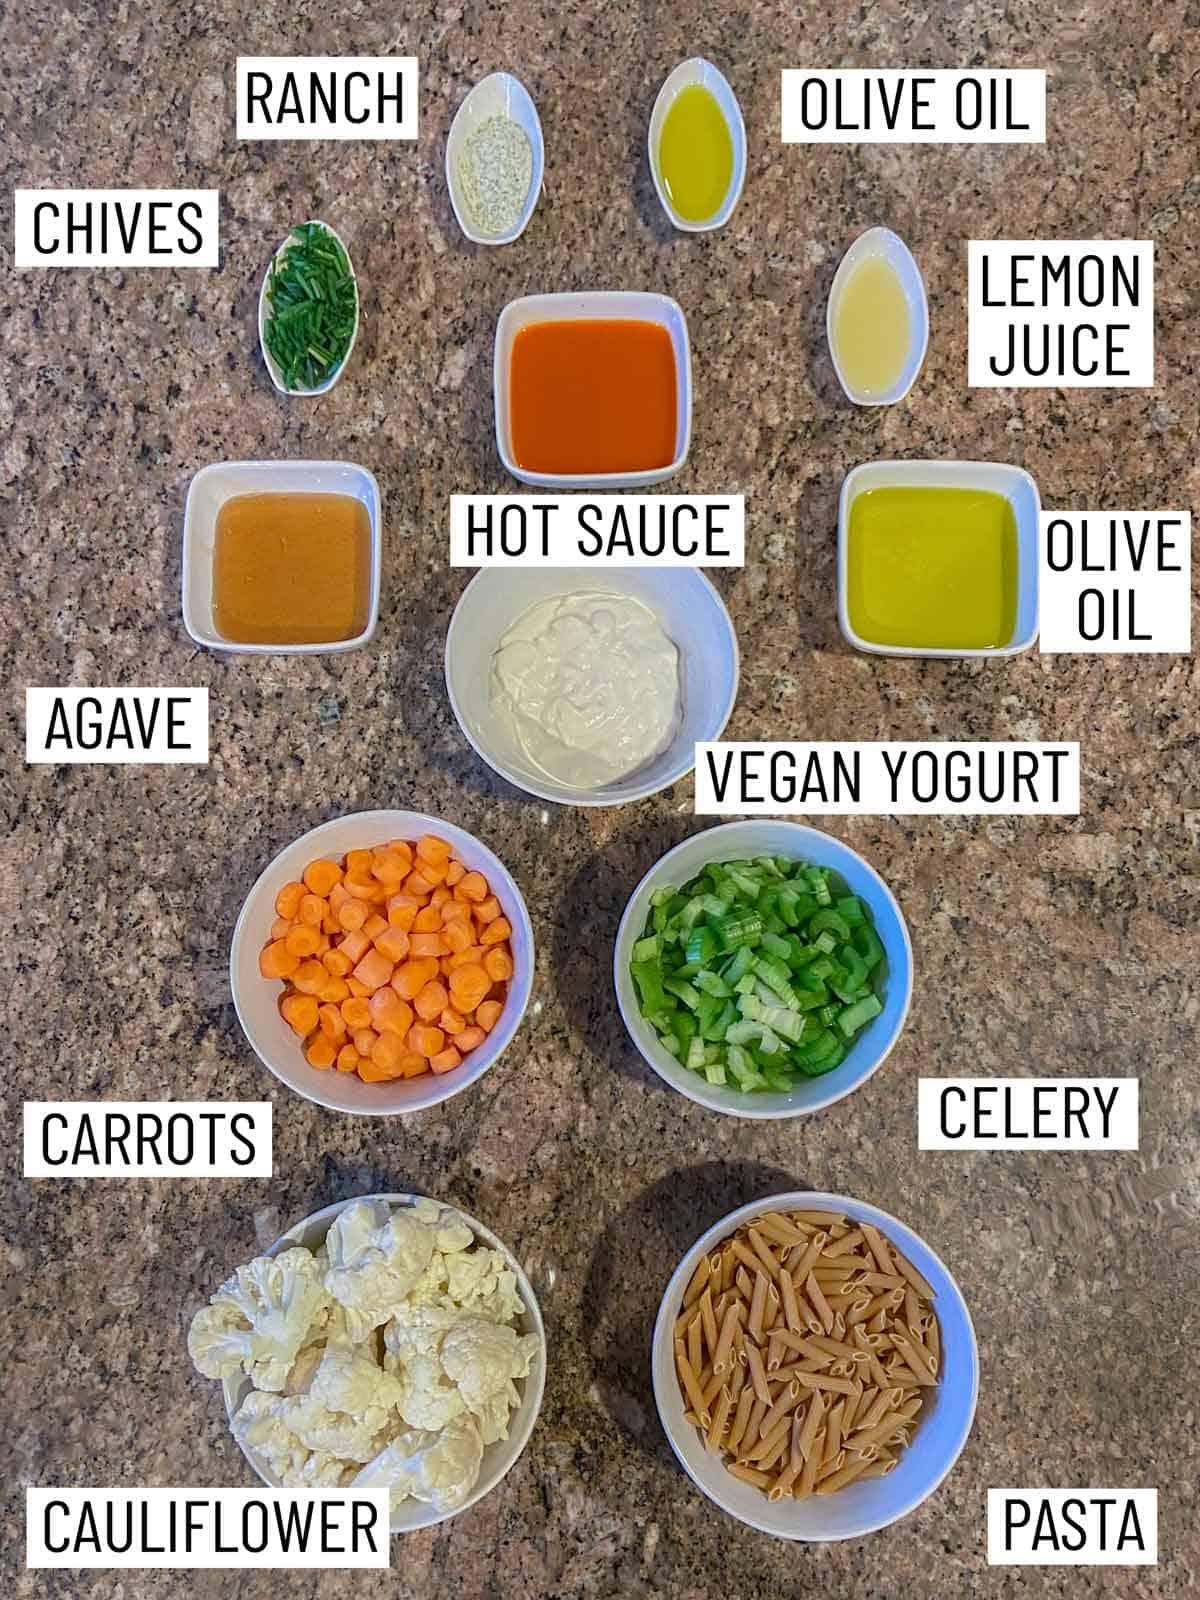 Ingredients needed to make buffalo pasta salad.